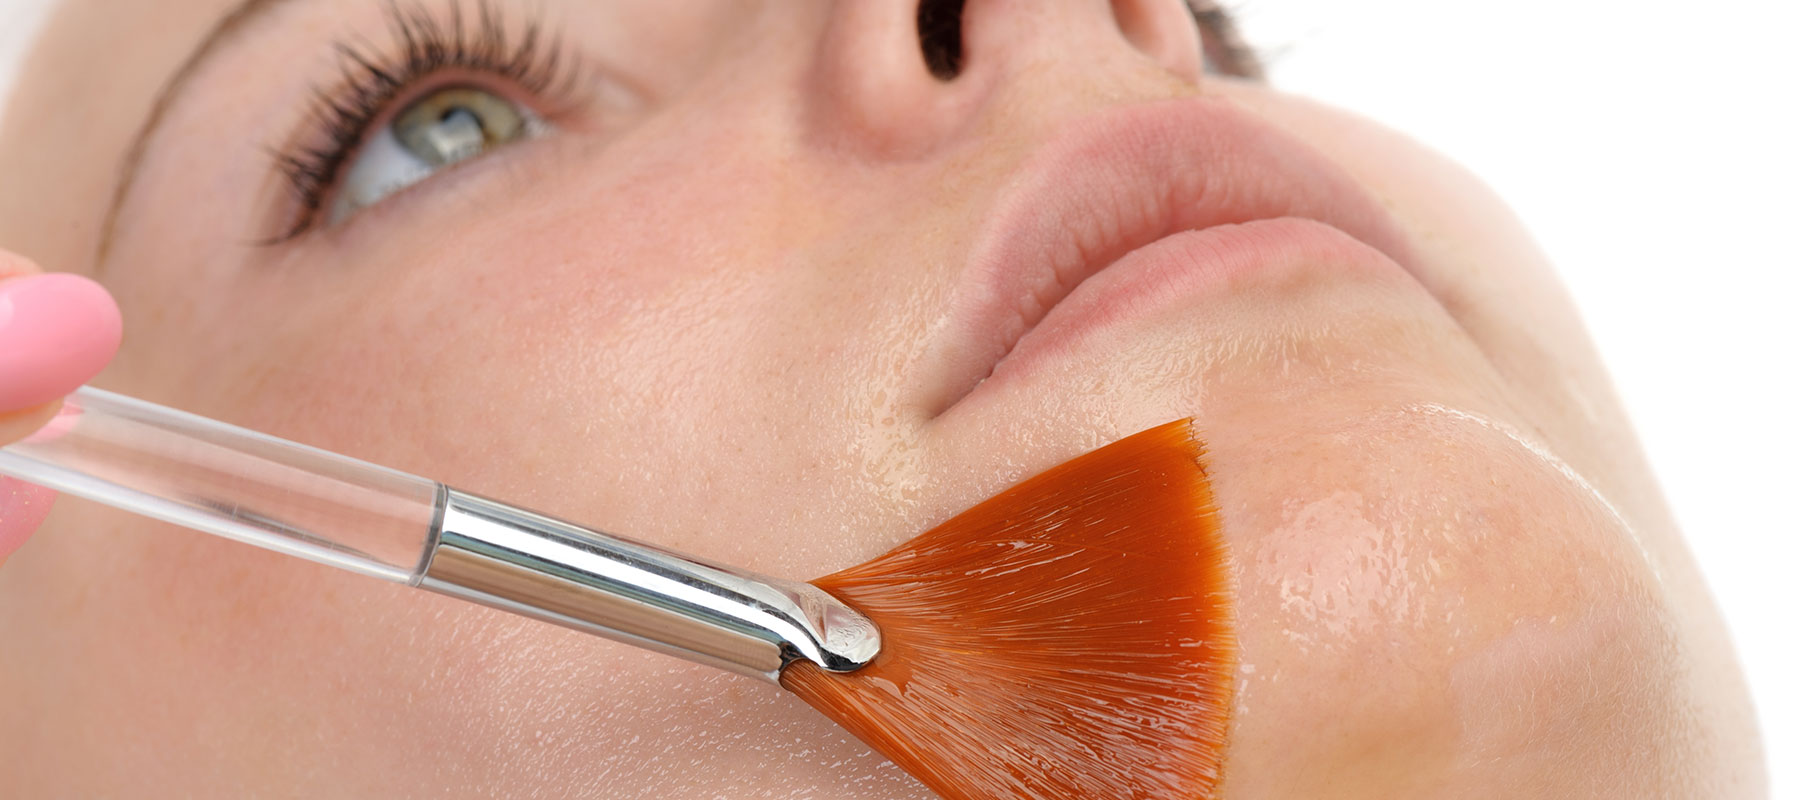 oviedo facial peels salon